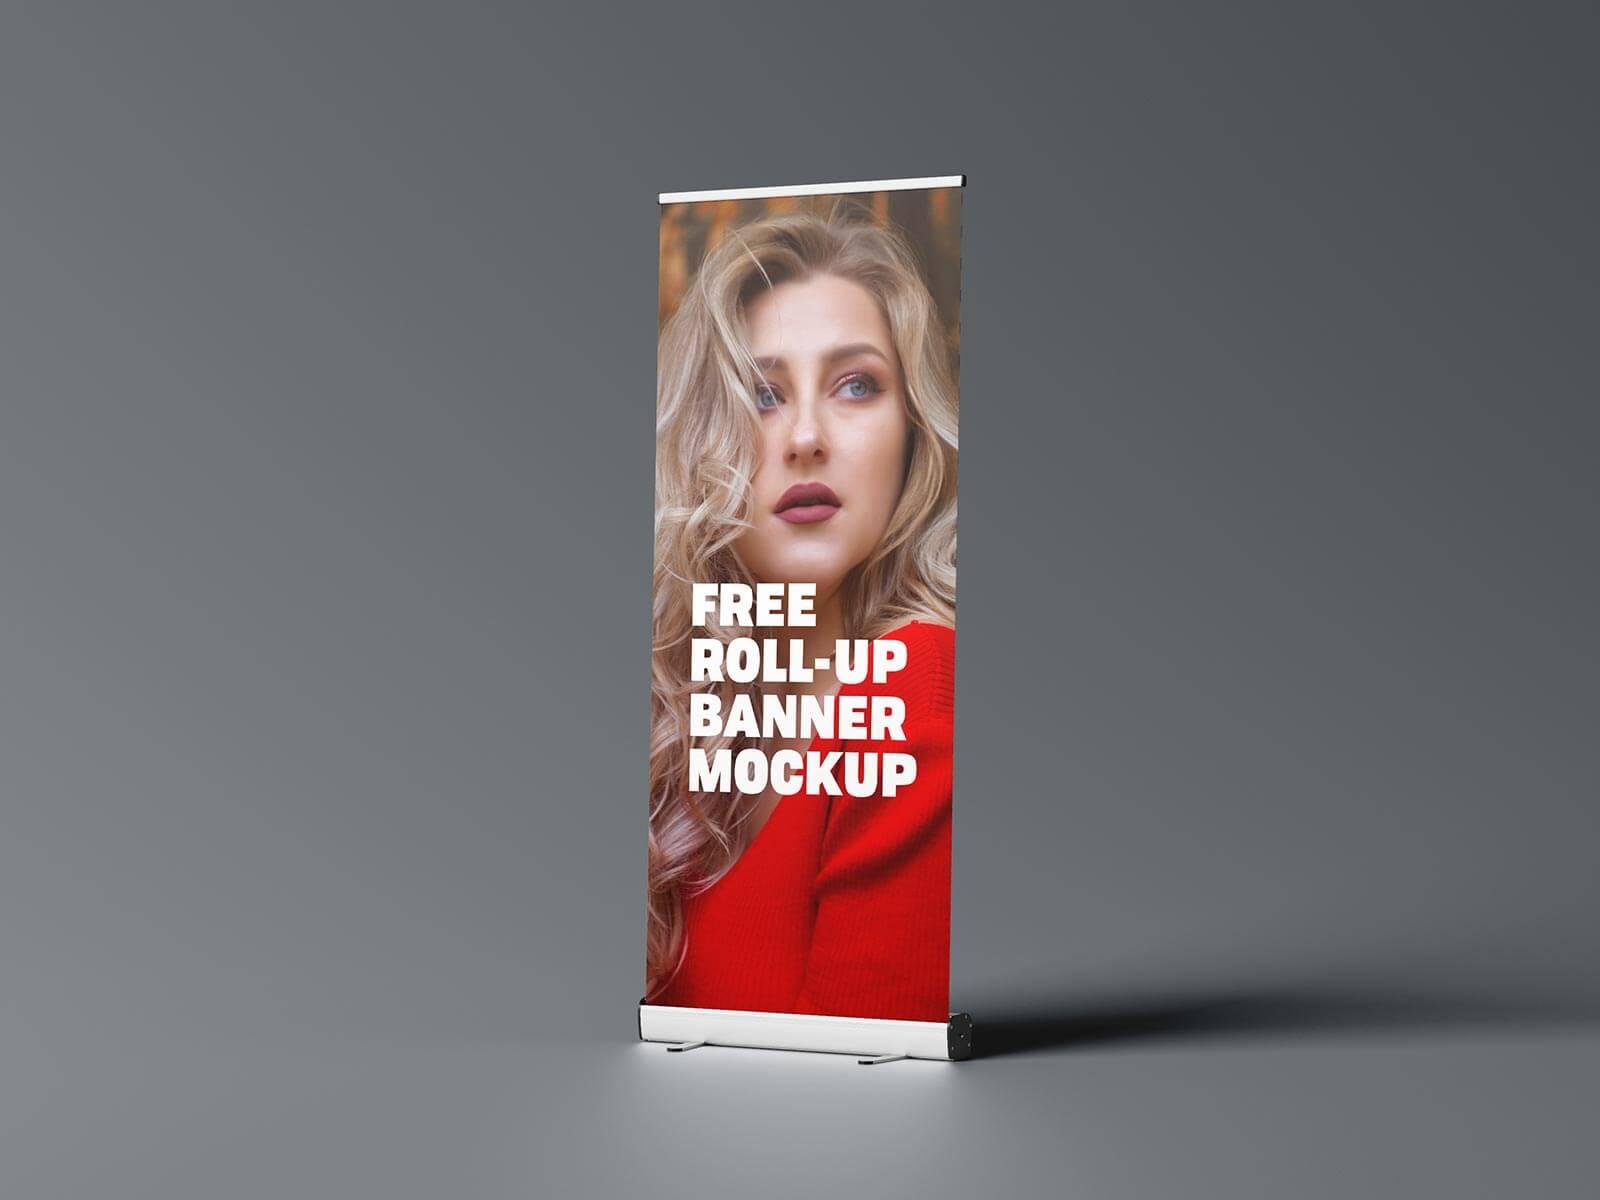 Free Roll-Up Vinyl Banner Mockup PSD Set